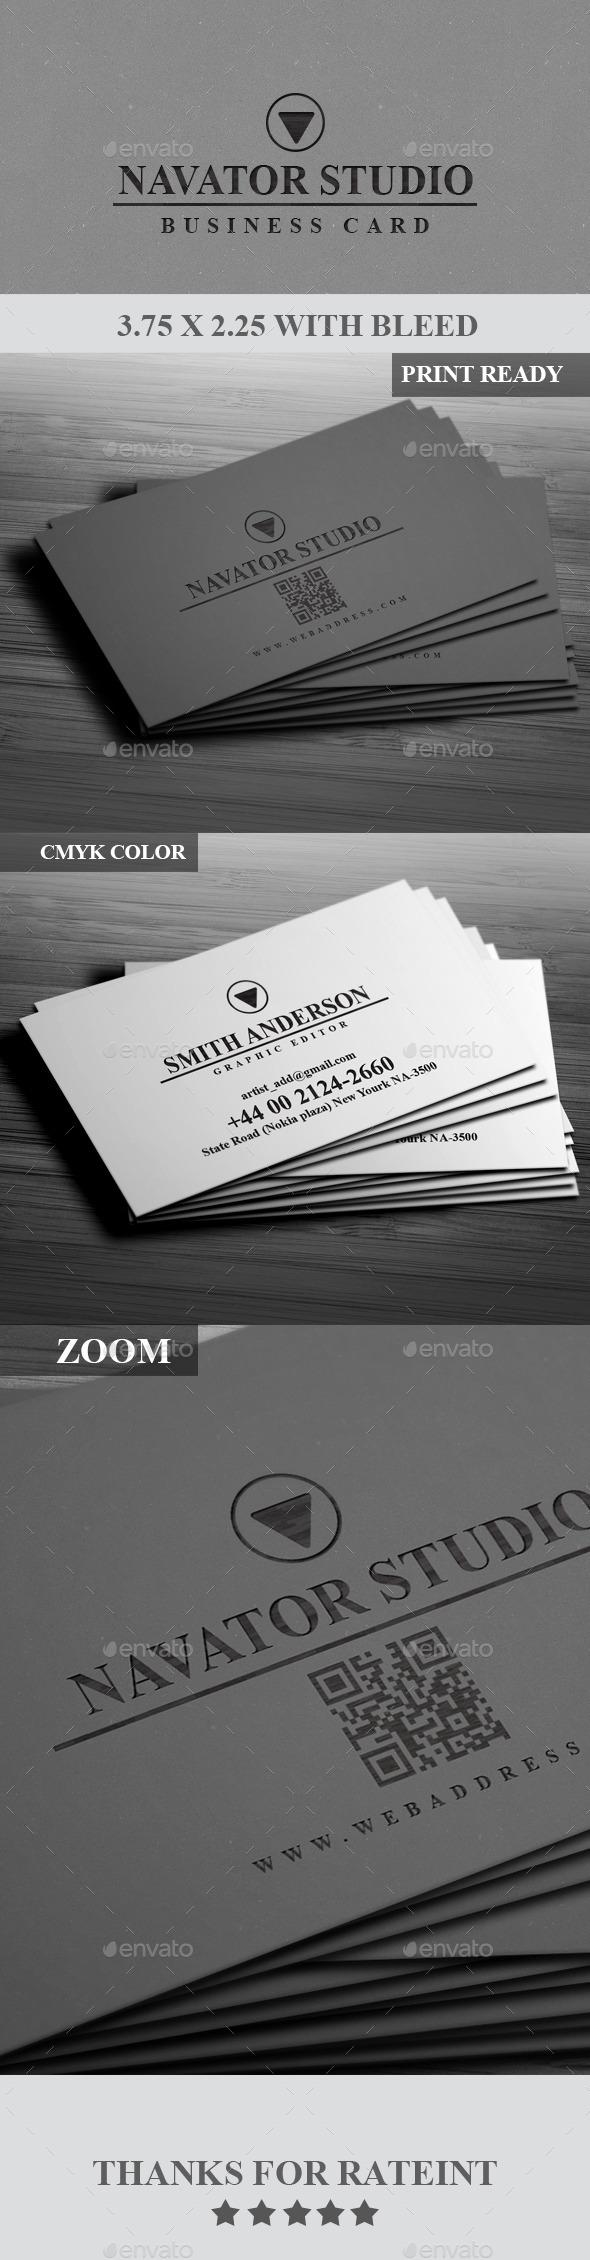 GraphicRiver Navaor Studio Business Card 9007653